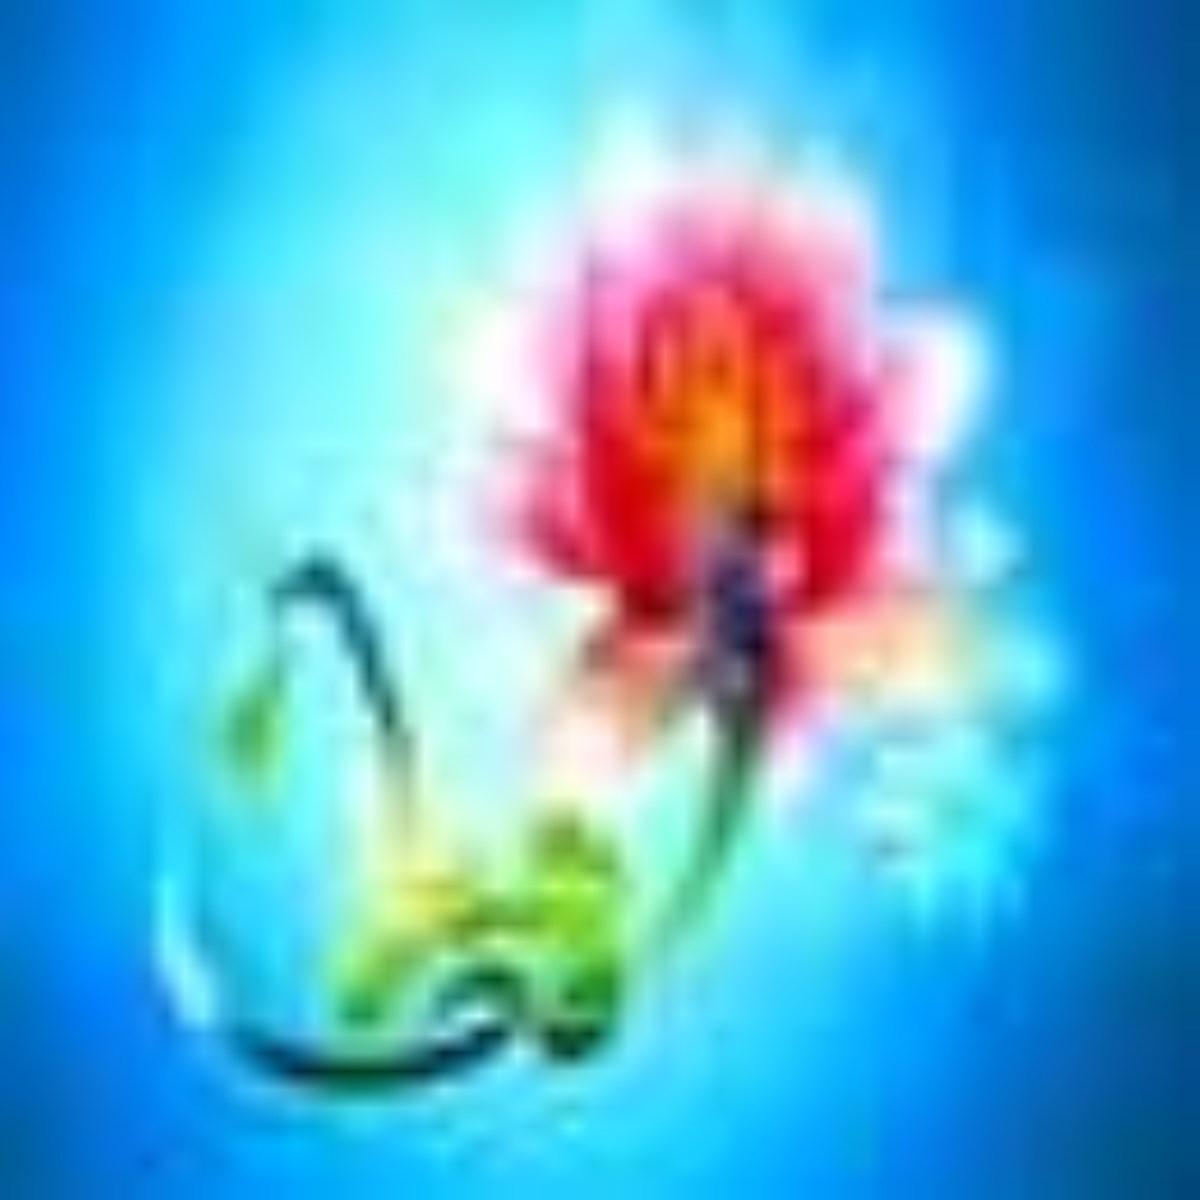 فاطمه سلام الله علیها اسوه و الگوی همسر داری